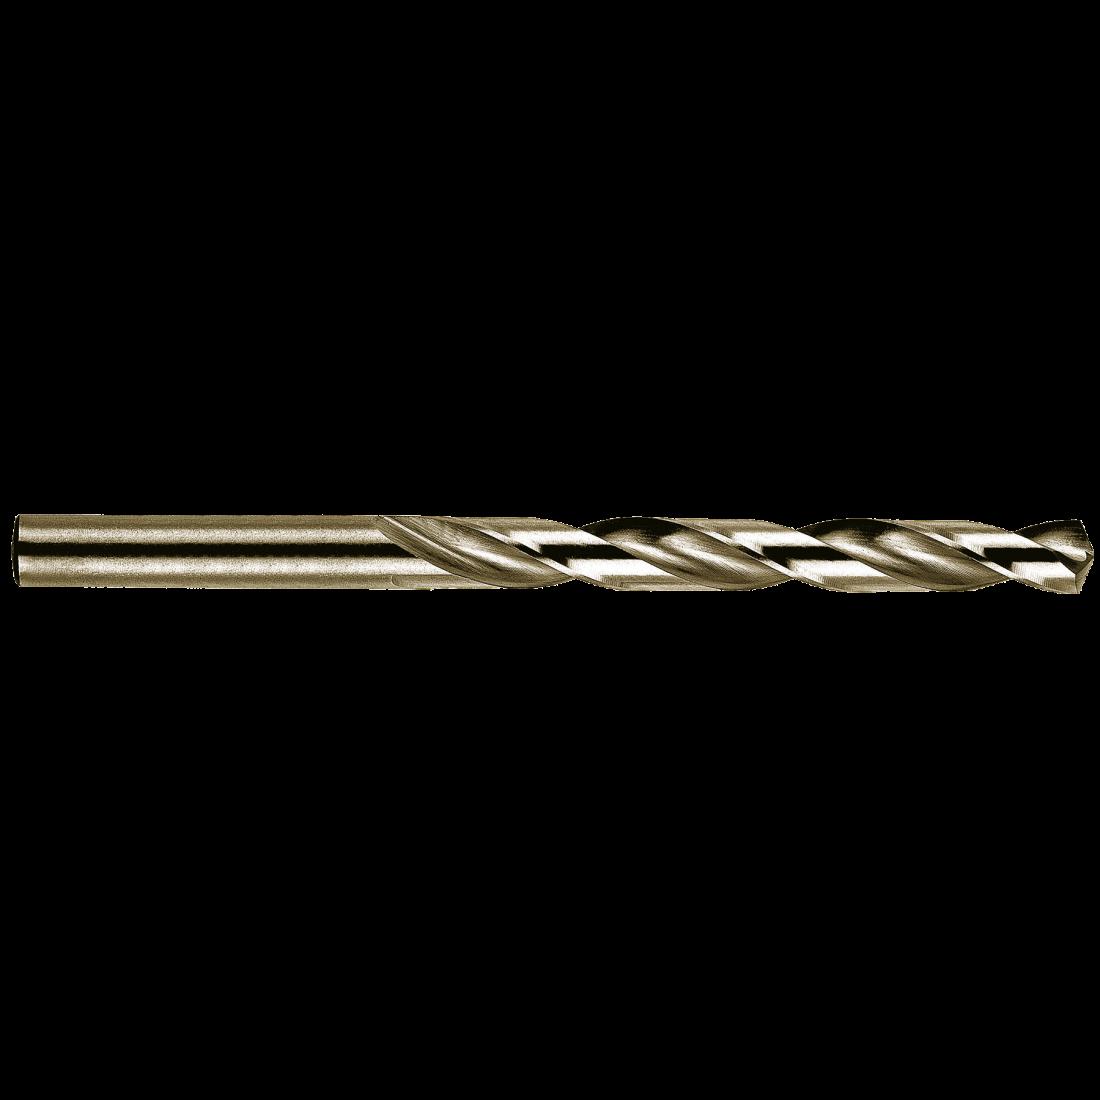 Сверло по металлу Heller НSS-Co DIN 338 RN  8x75x117мм (10шт)